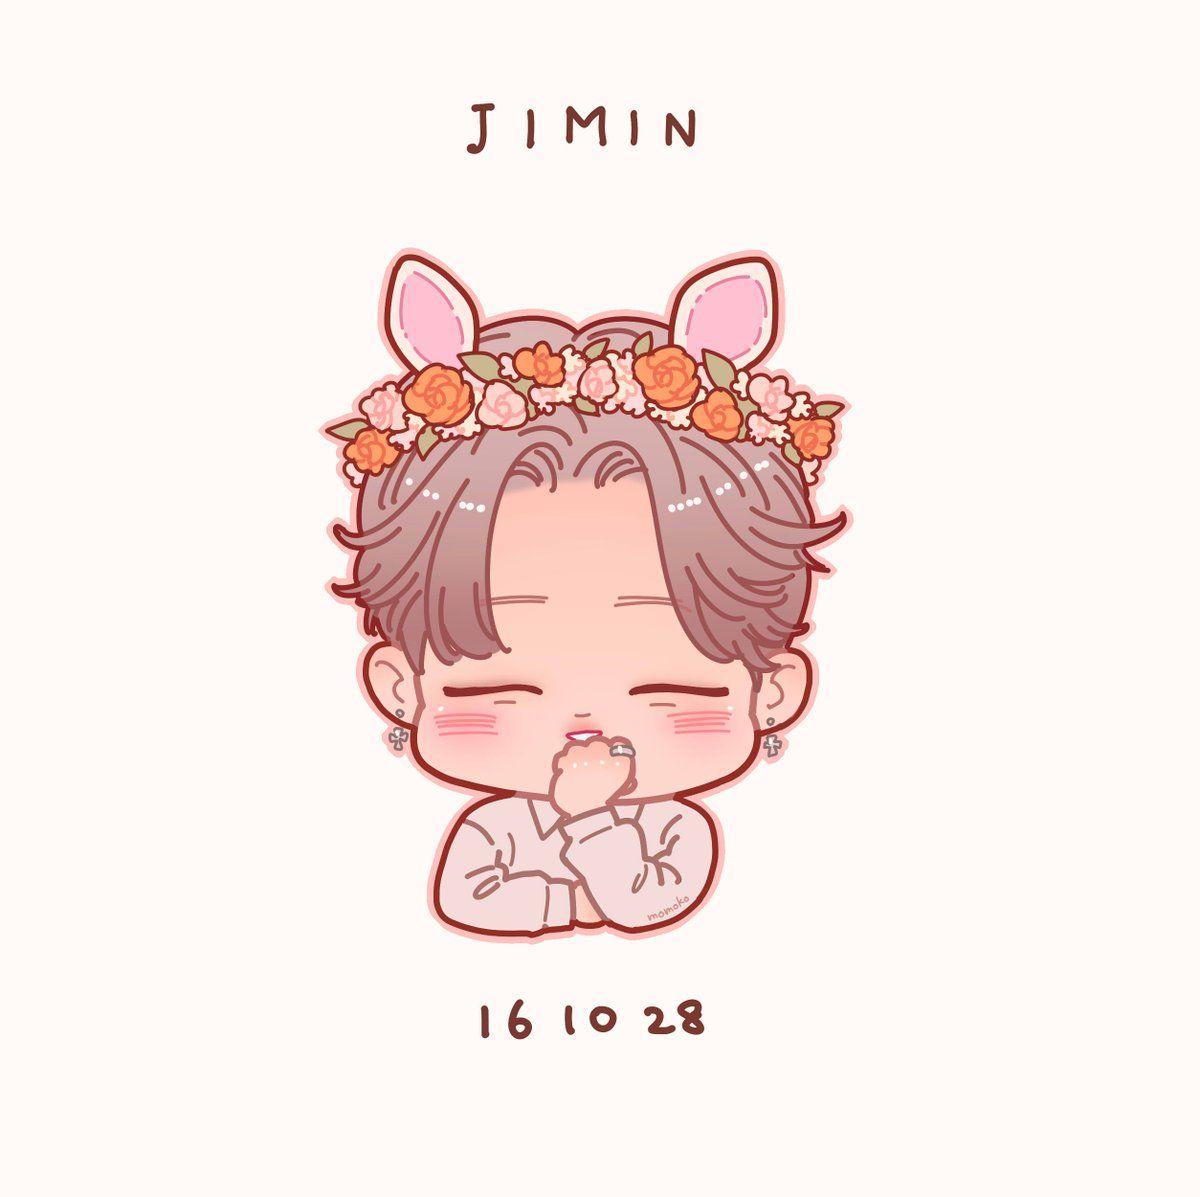 FanArt || Jimin || BTS♥ | drawing | Pinterest | Chibi, Dibujo y Oppas